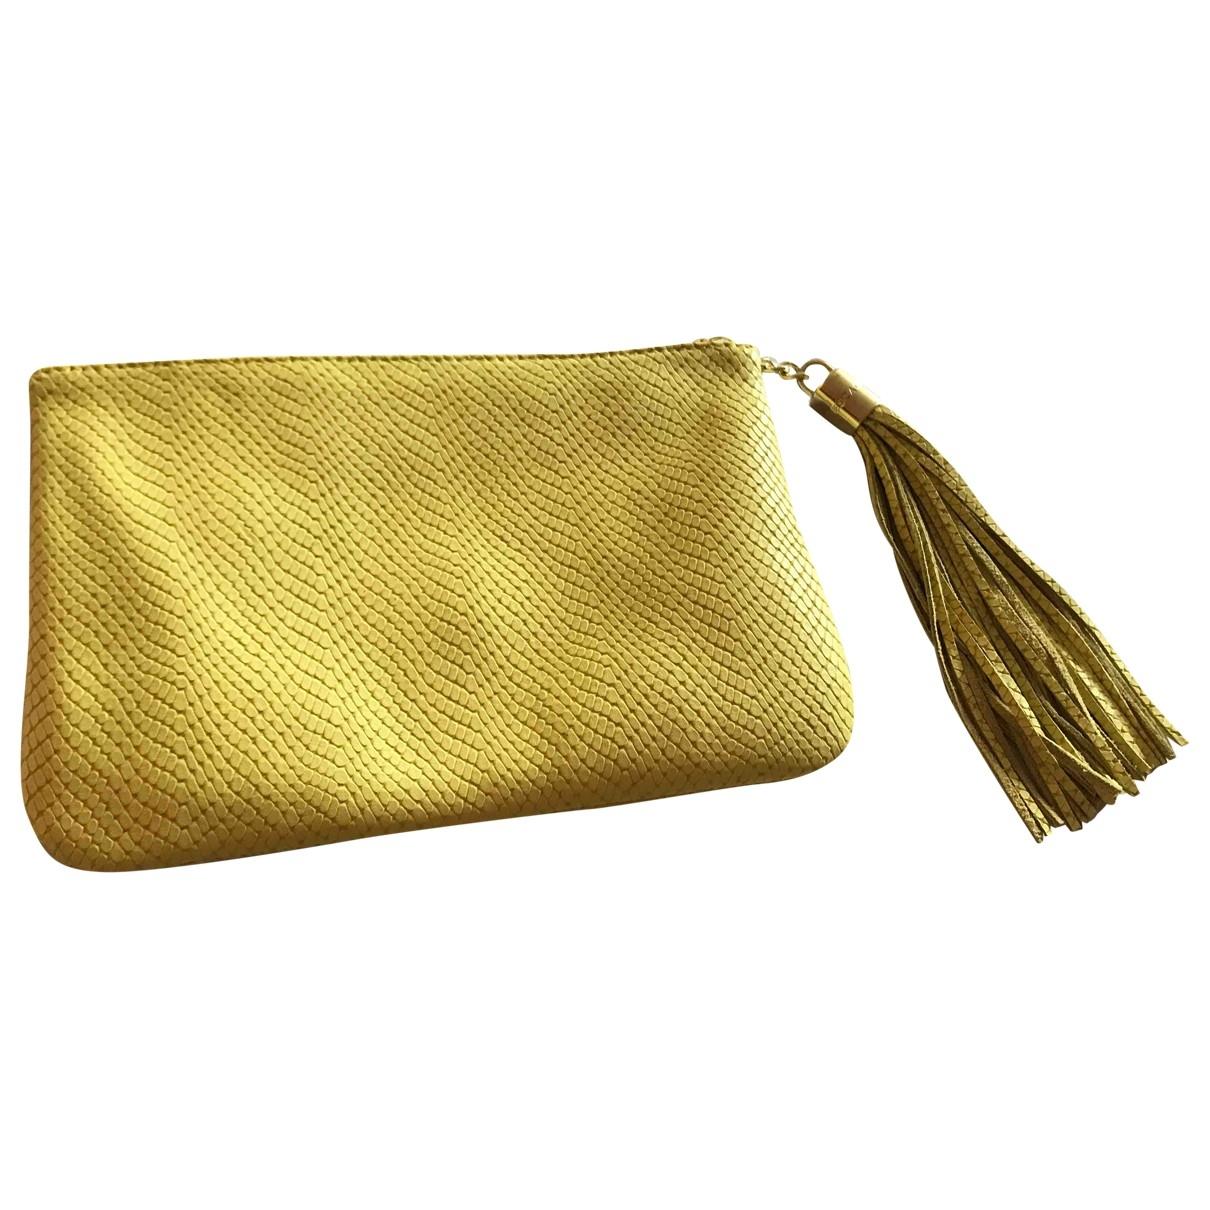 Escada - Petite maroquinerie   pour femme en cuir - jaune